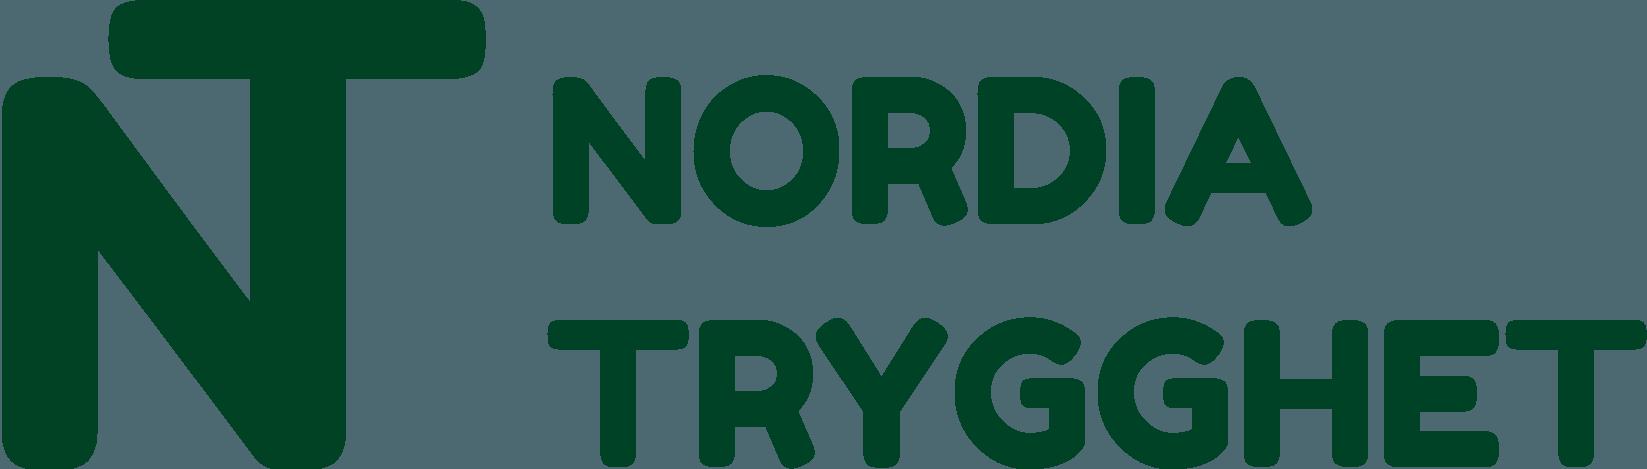 Nordia Trygghet